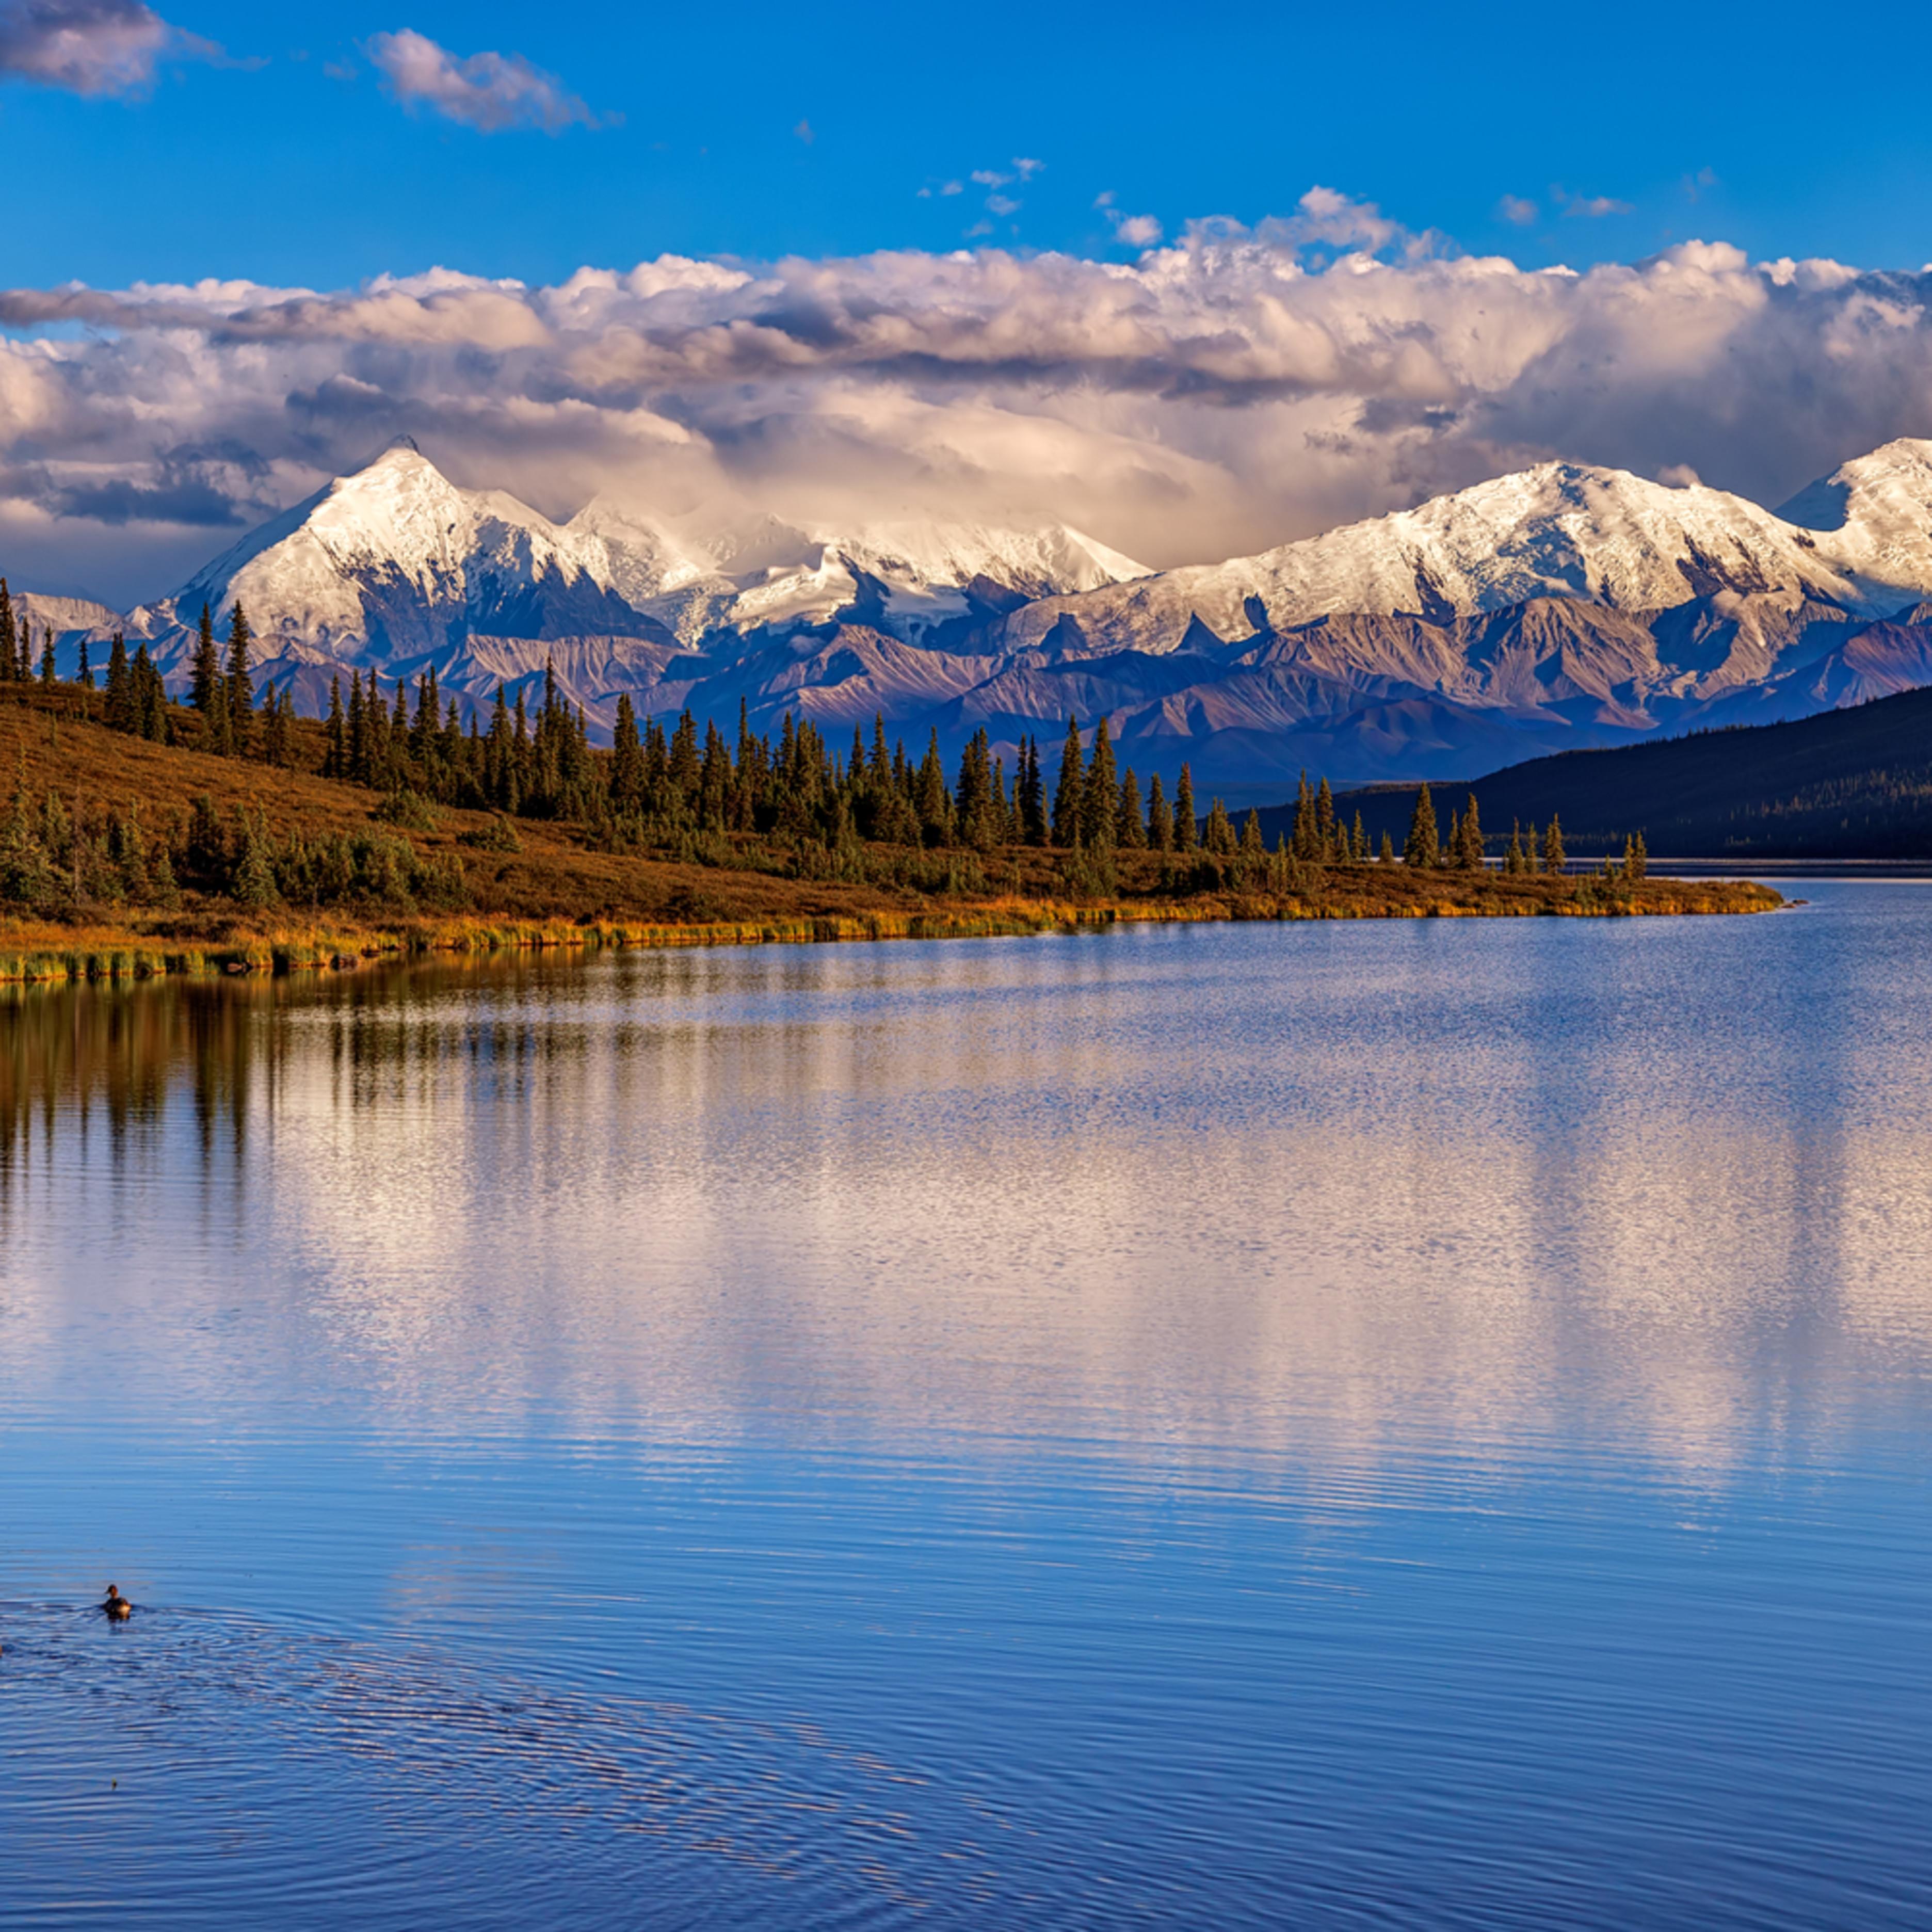 Alaska 08 16 10 1018a ksjtta